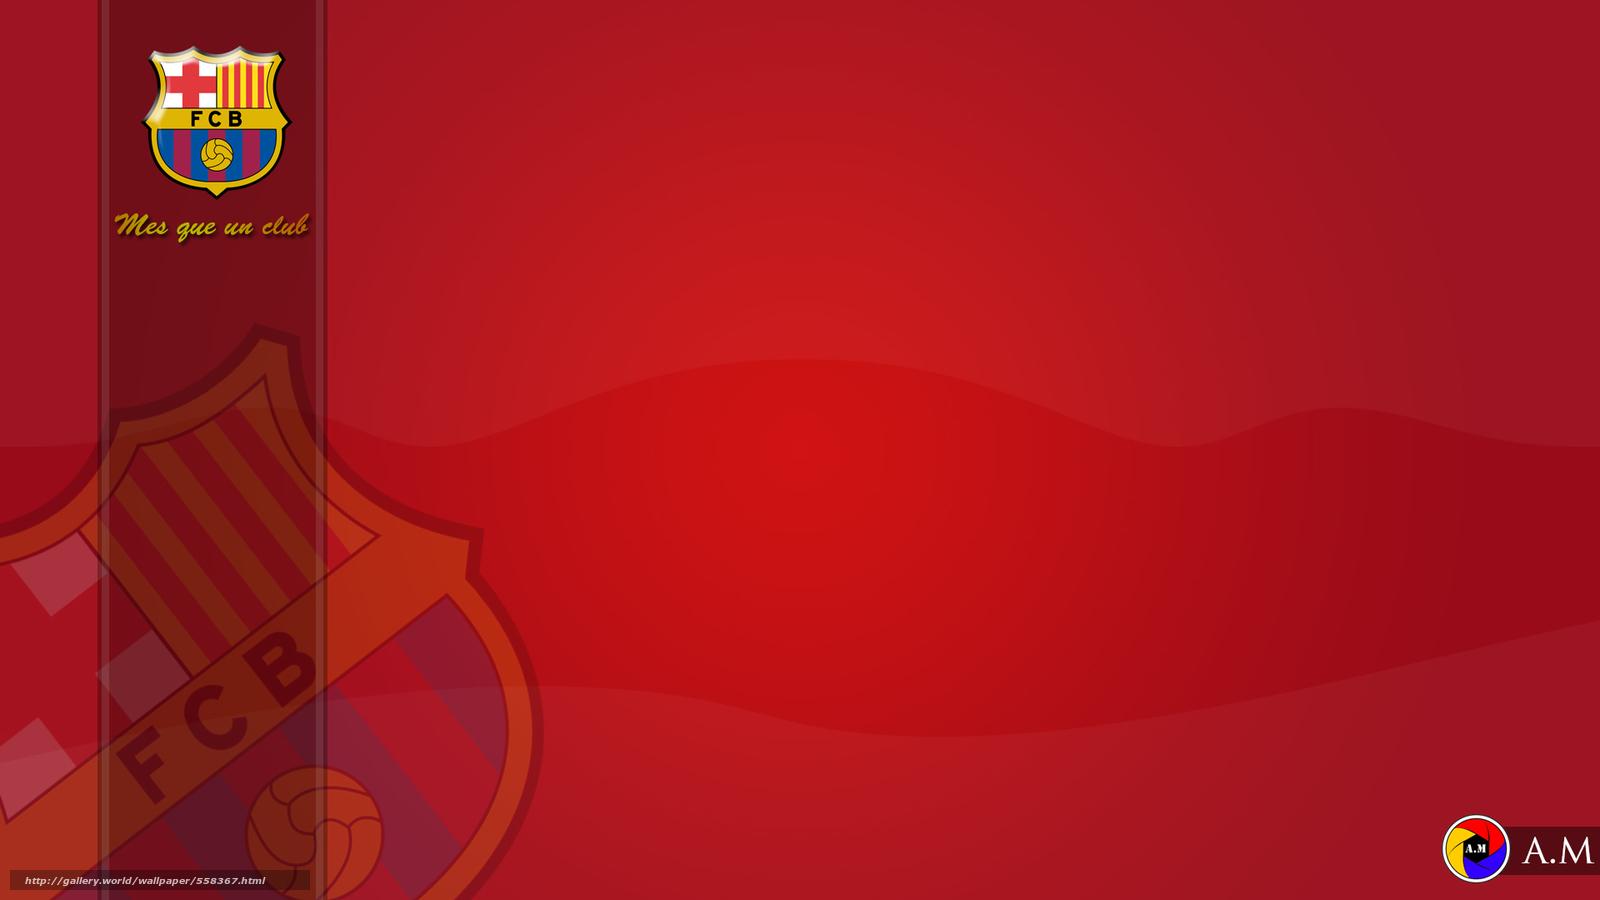 Baixar Wallpaper Futebol, Fcbarcelona, Barca, Logotipo